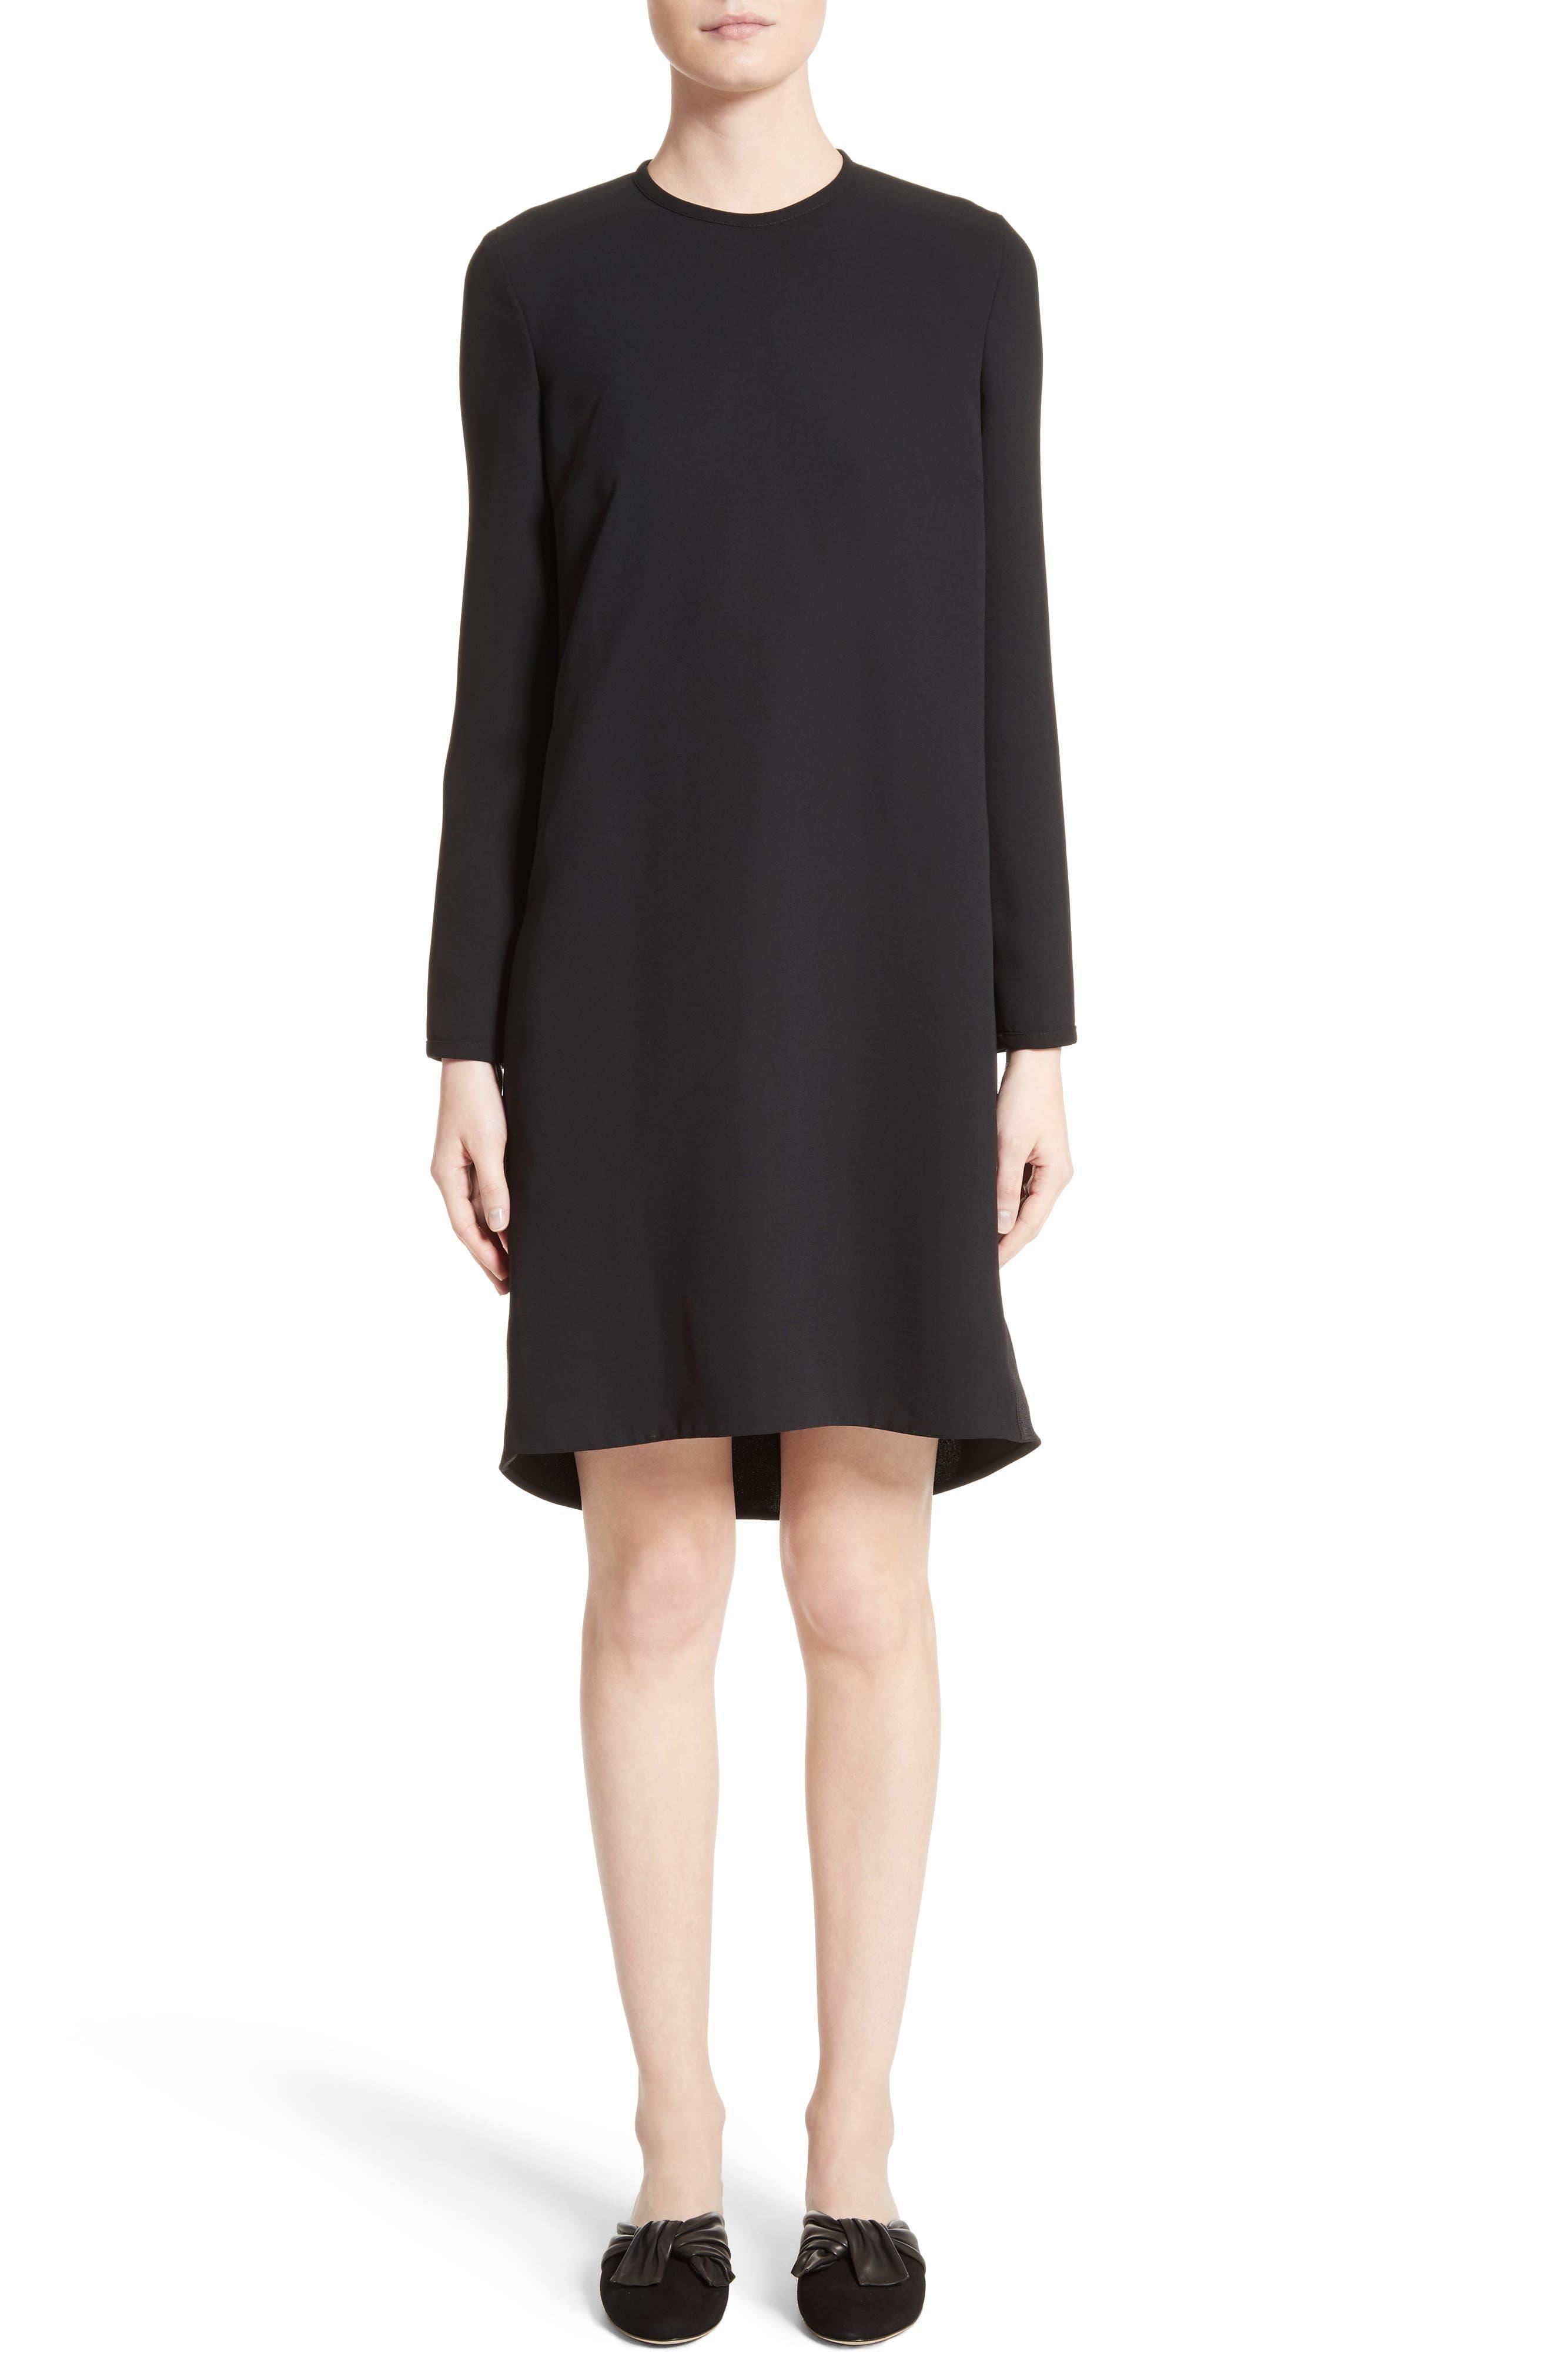 Alternate Image 1 Selected - Victoria, Victoria Beckham Gathered Open Back Shift Dress